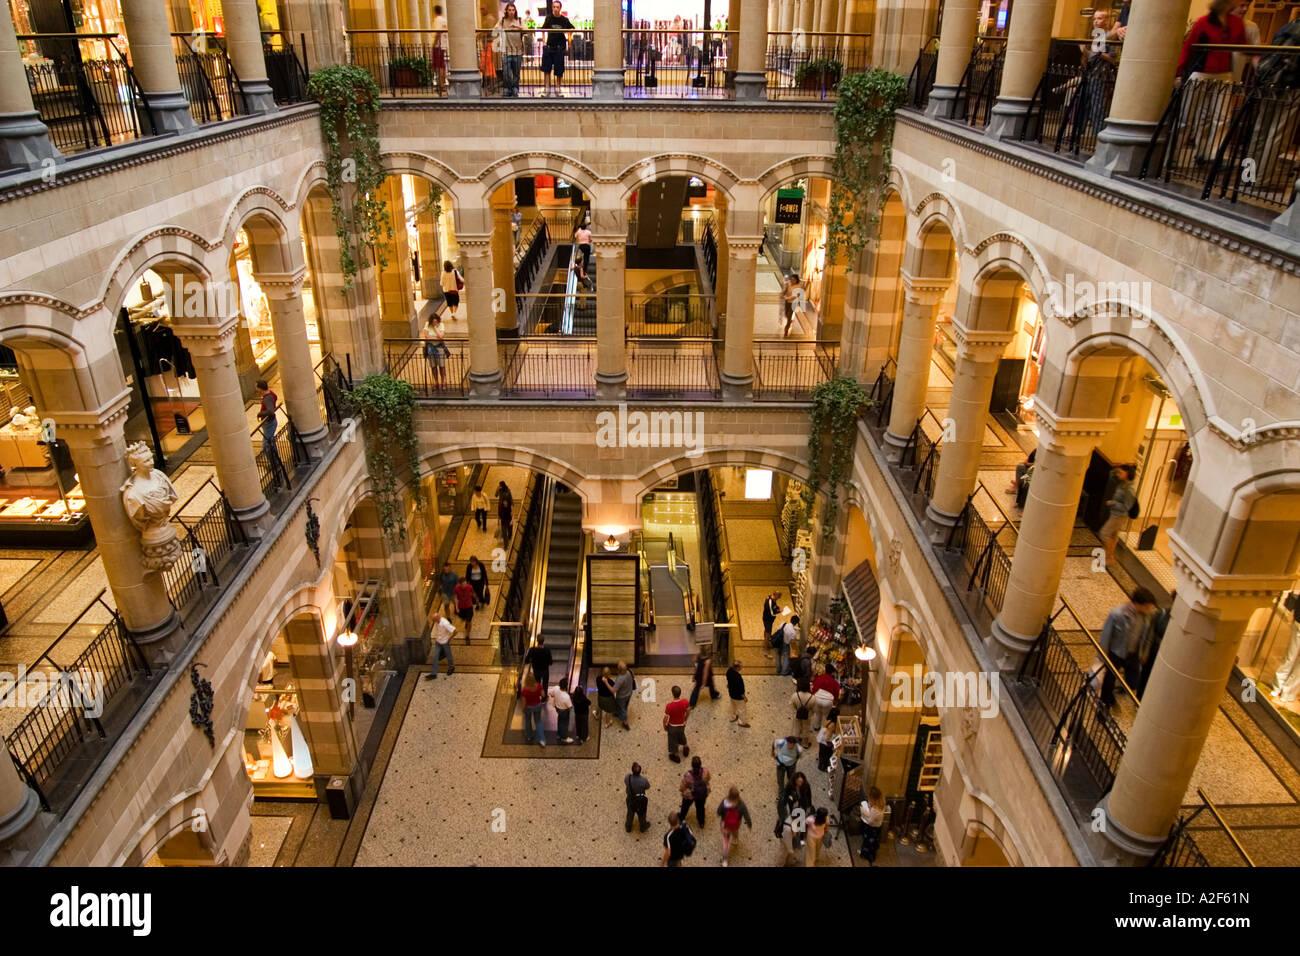 Amsterdam Magna Plaza shopping center Atrium - Stock Image